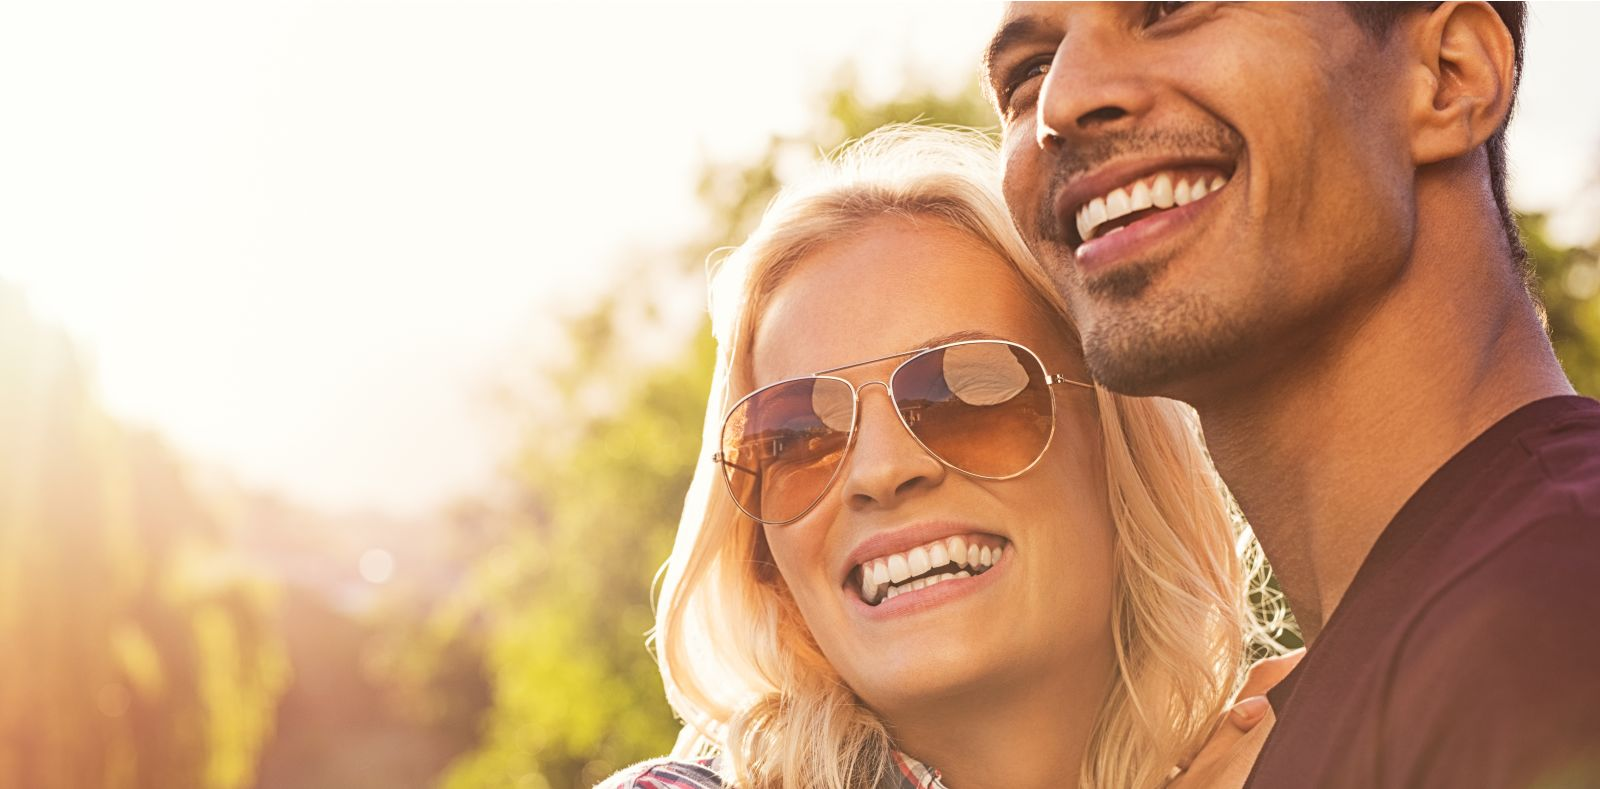 West Covina eyecare optometry